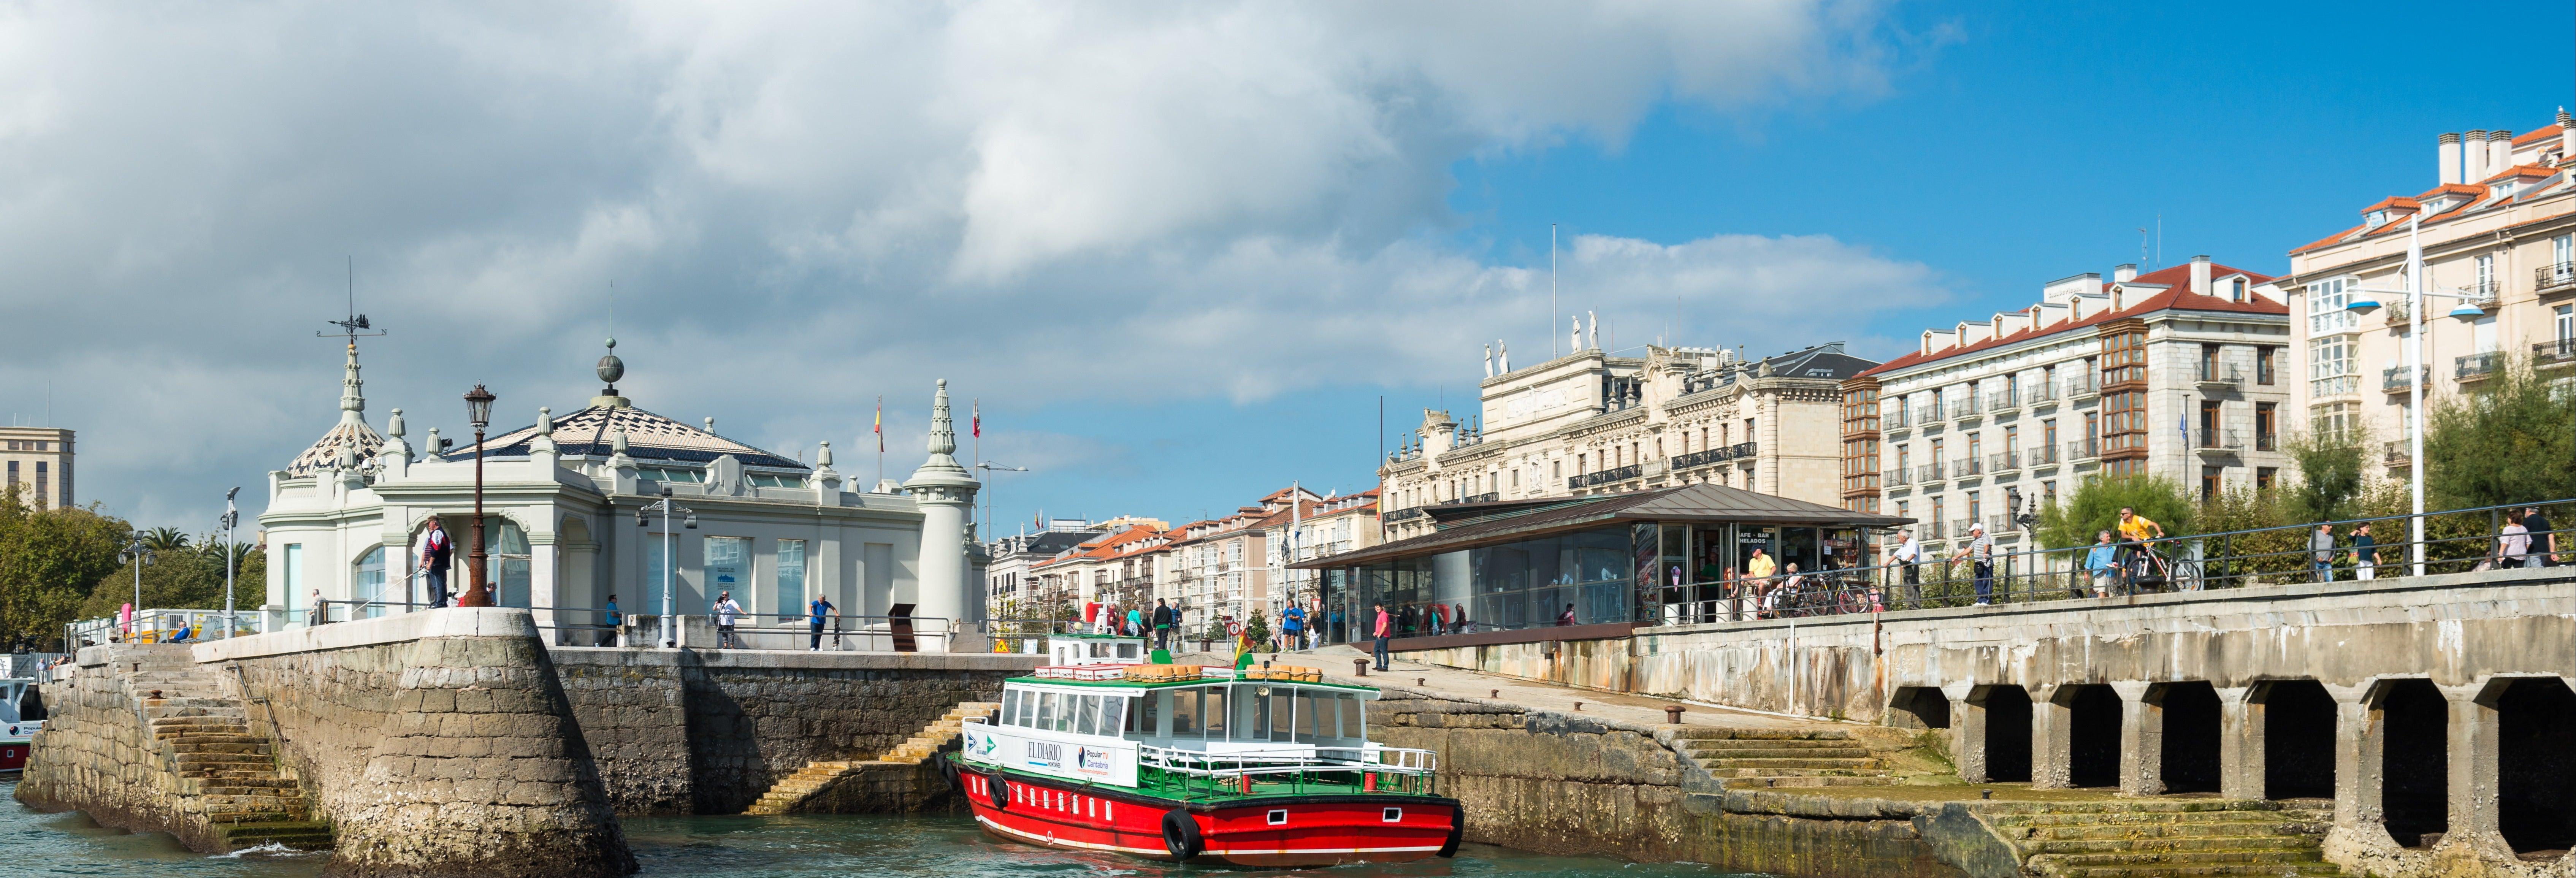 Passeio de barco pela baía de Santander